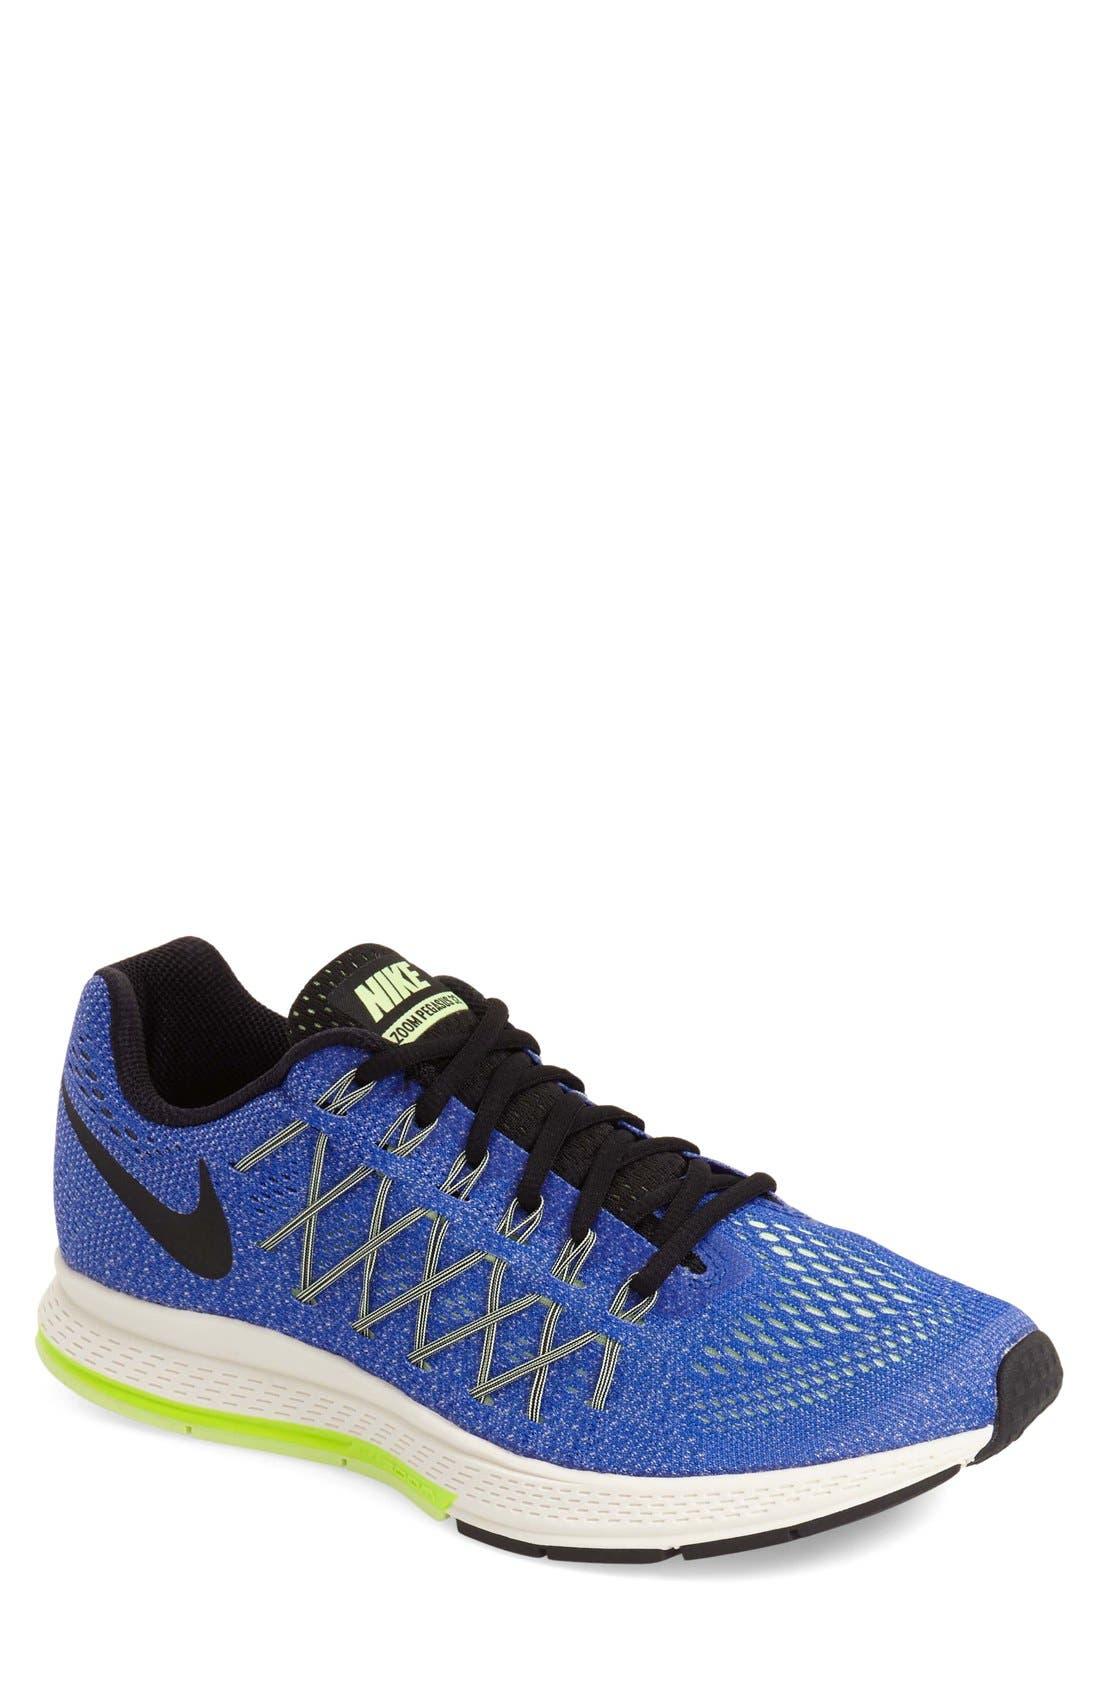 Alternate Image 1 Selected - Nike 'Zoom Pegasus 32' Running Shoe (Men)